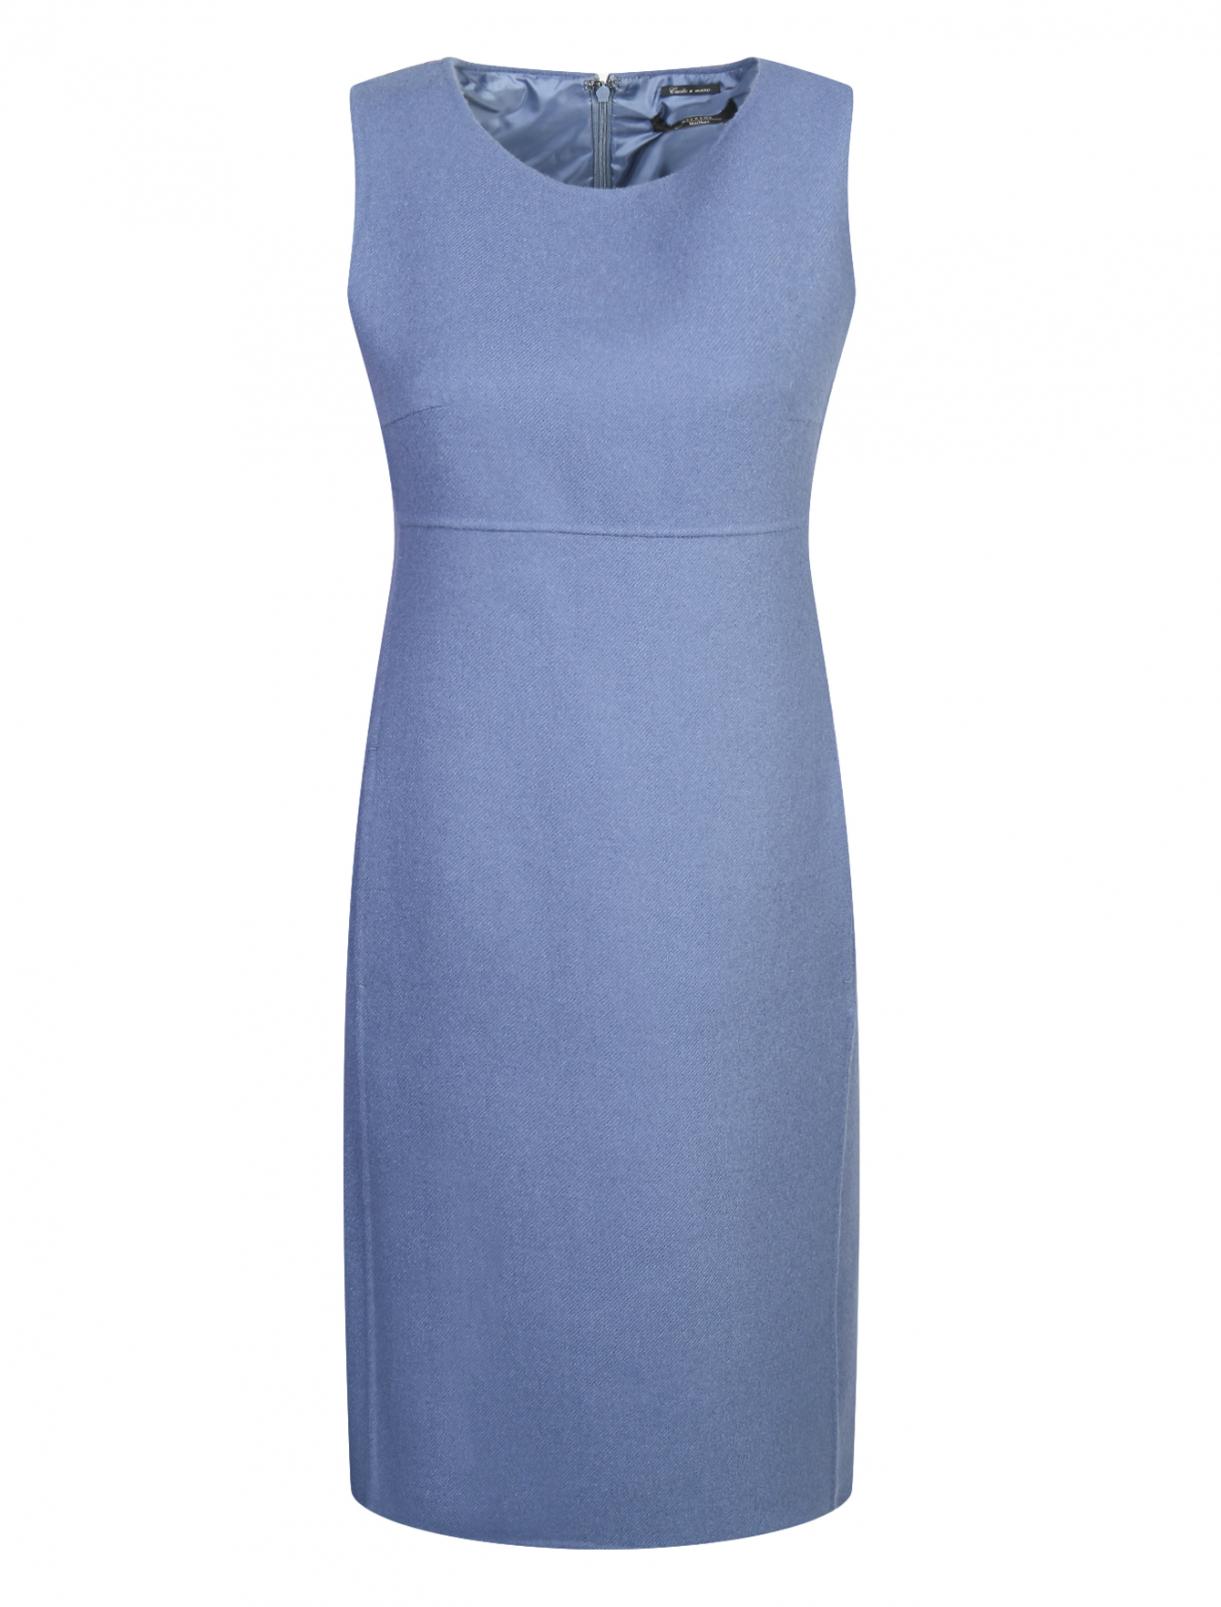 Платье-футляр  из шерсти Weekend Max Mara  –  Общий вид